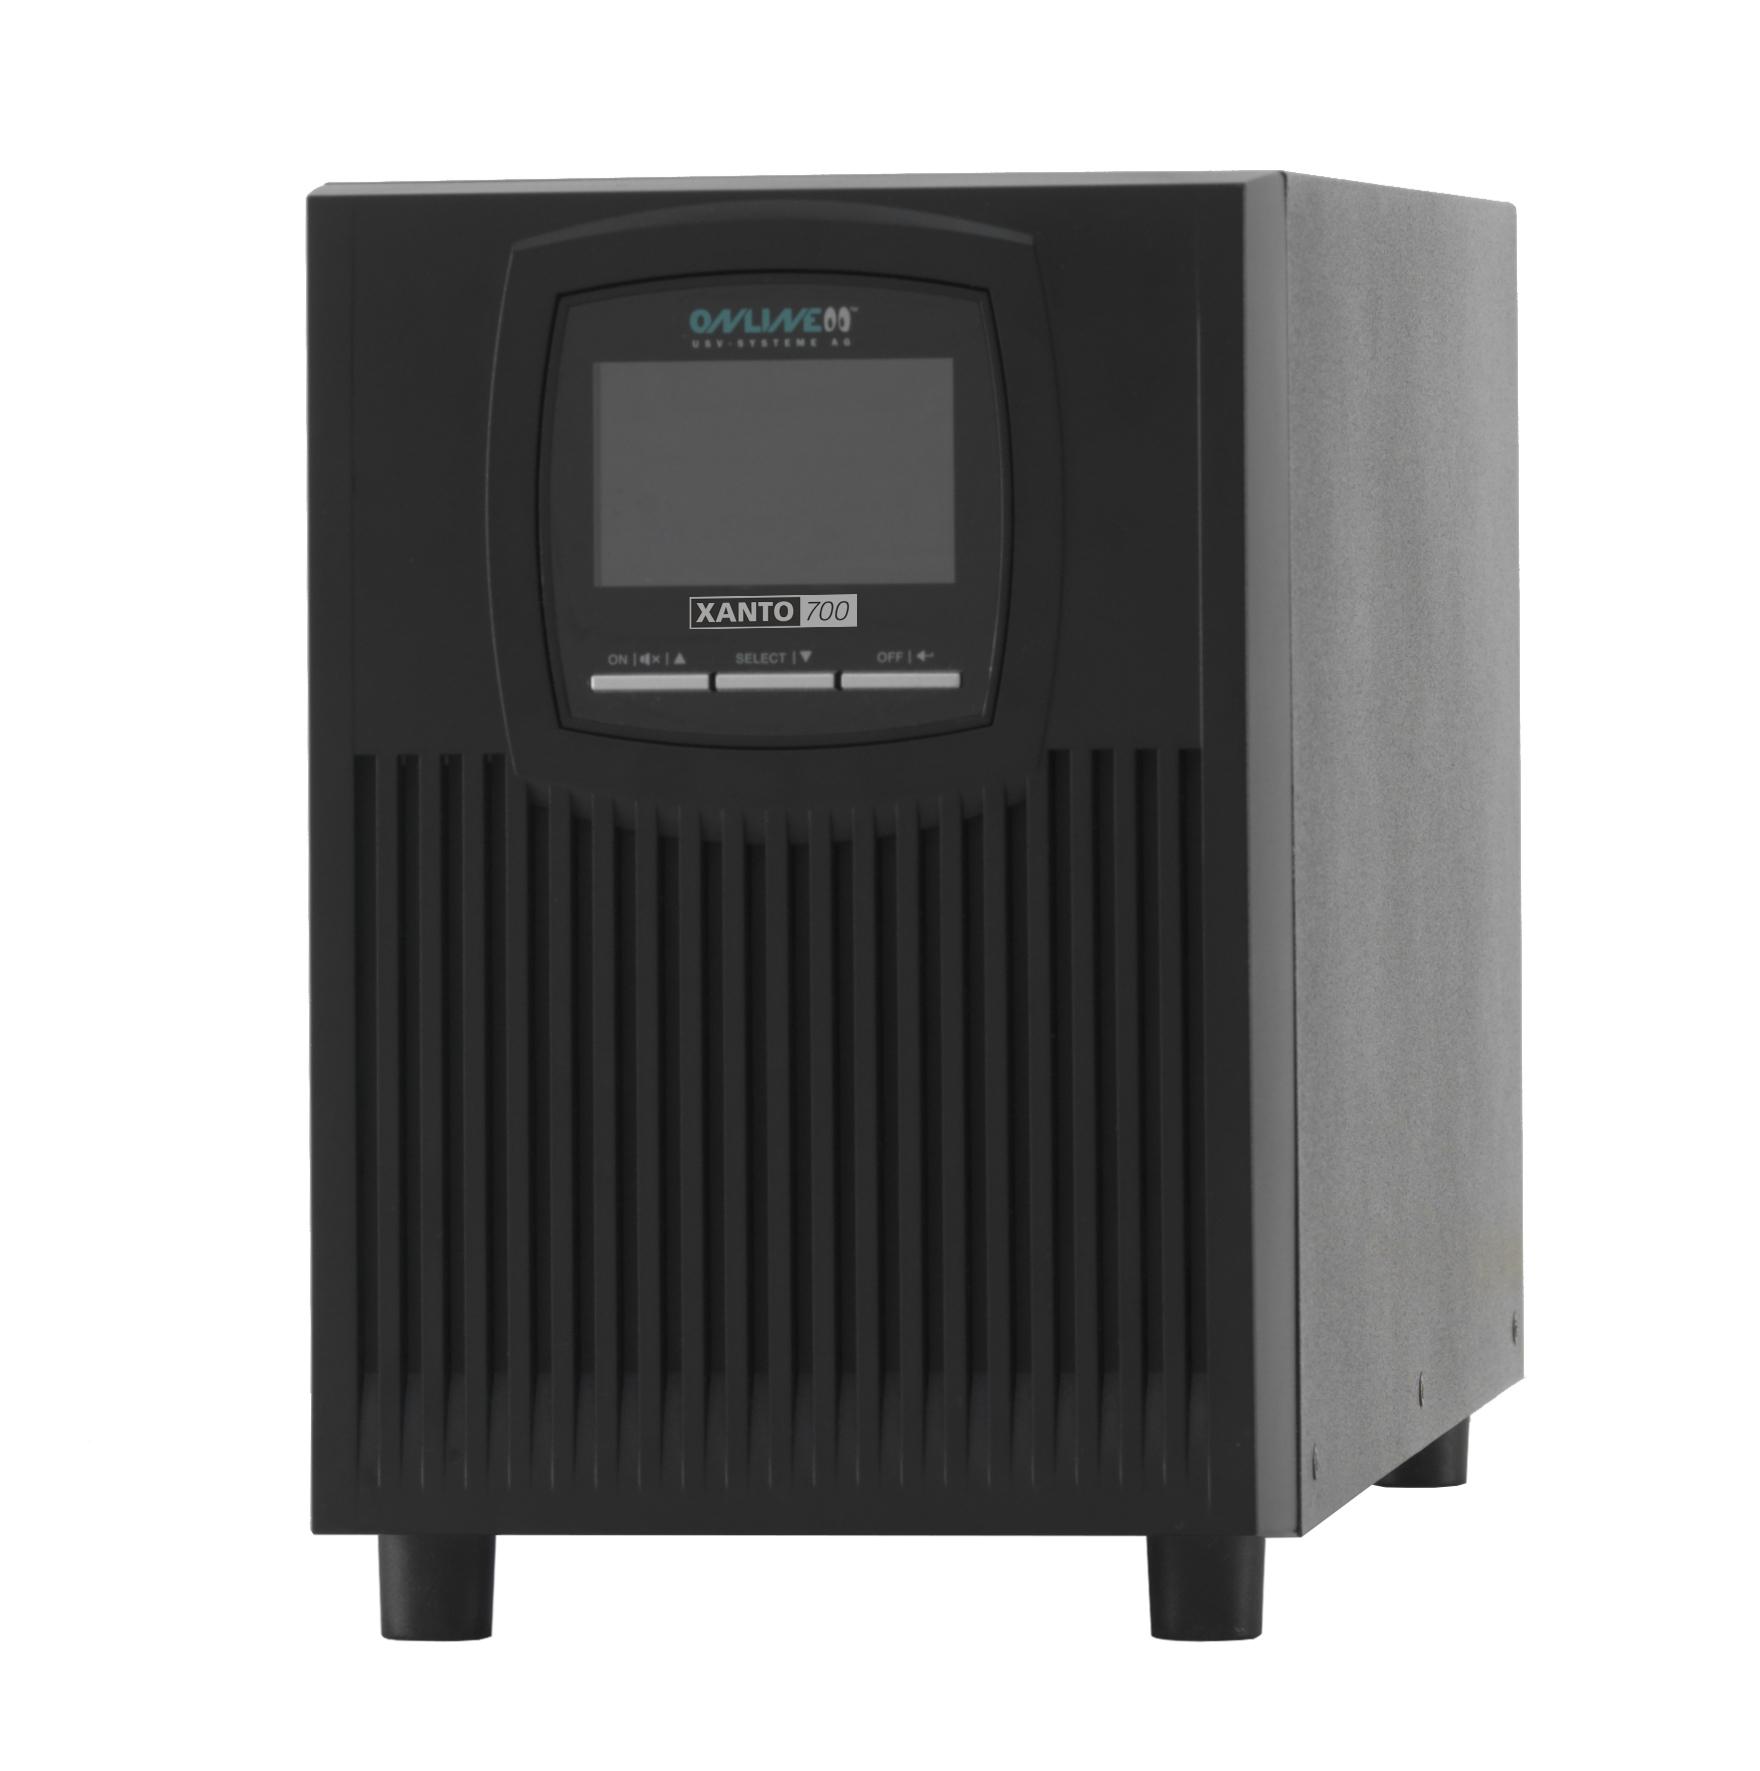 ONLINE USV-Systeme XANTO 700 uninterruptible power supply (UPS) Double-conversion (Online) 700 VA 70